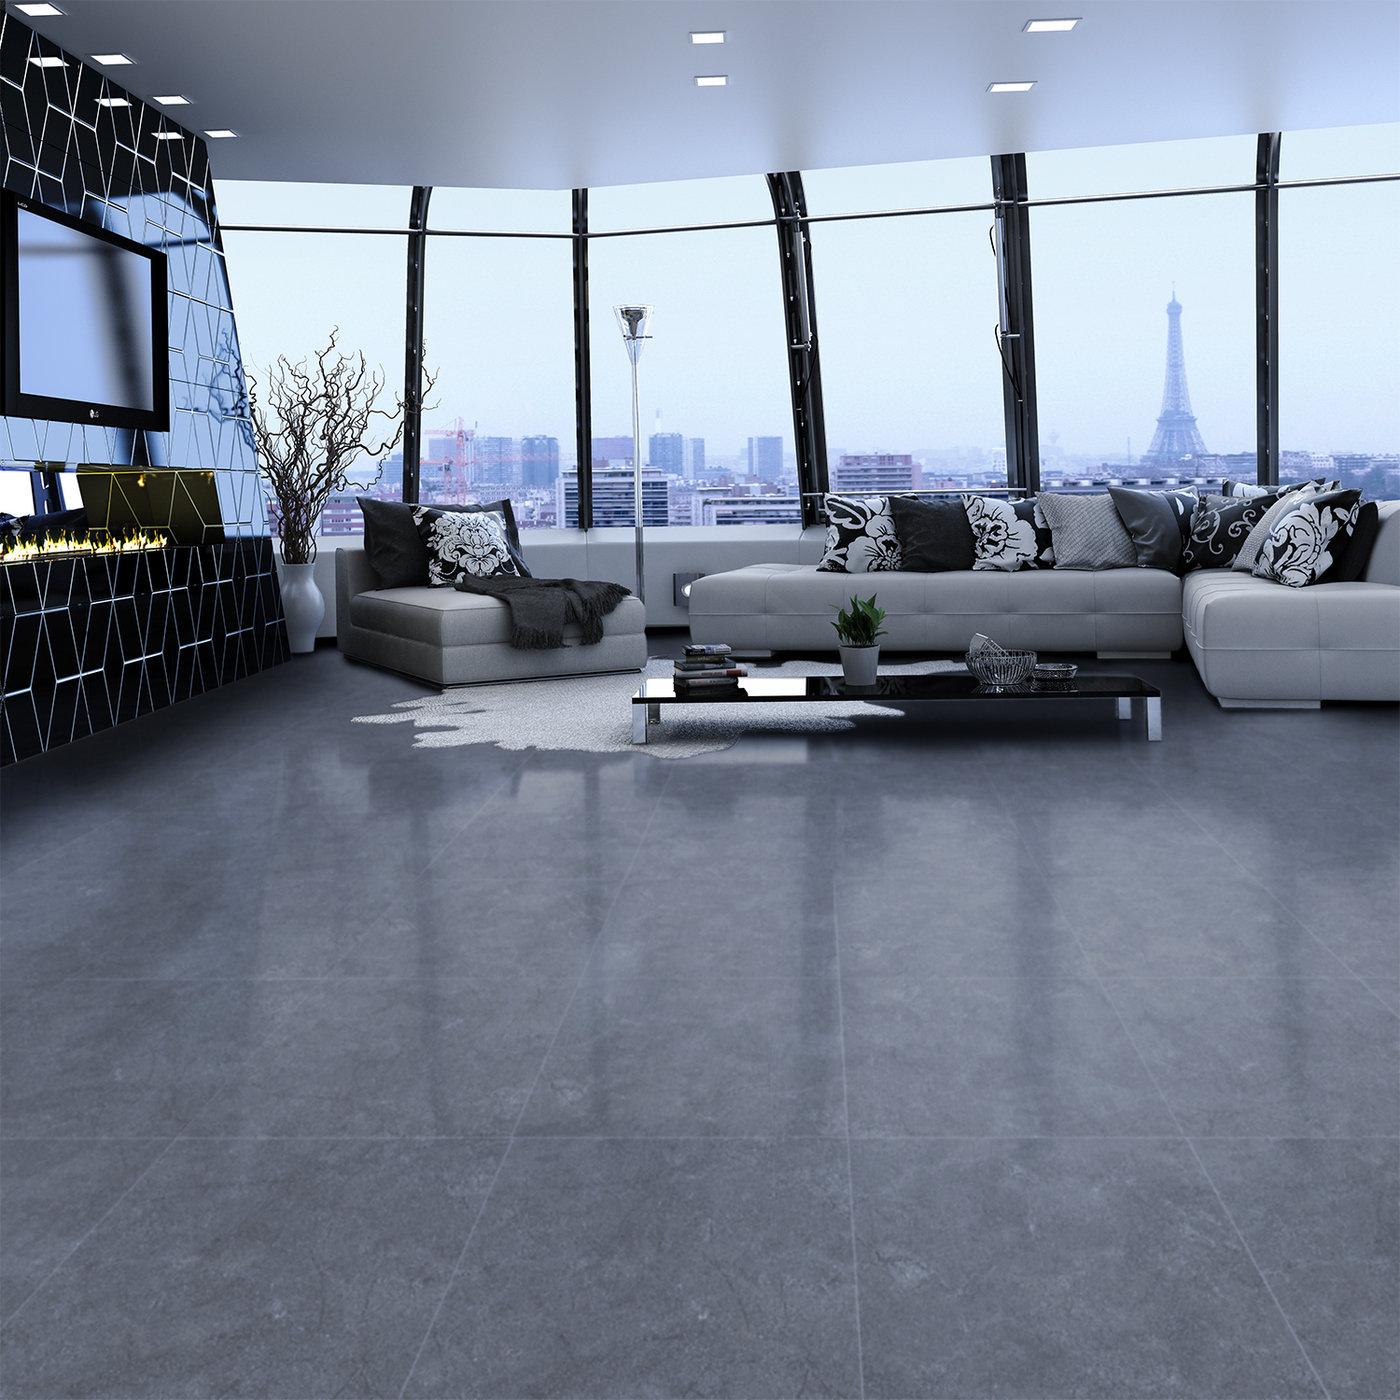 ceramic floor tiles by RENDERWILD C G  at Coroflot com